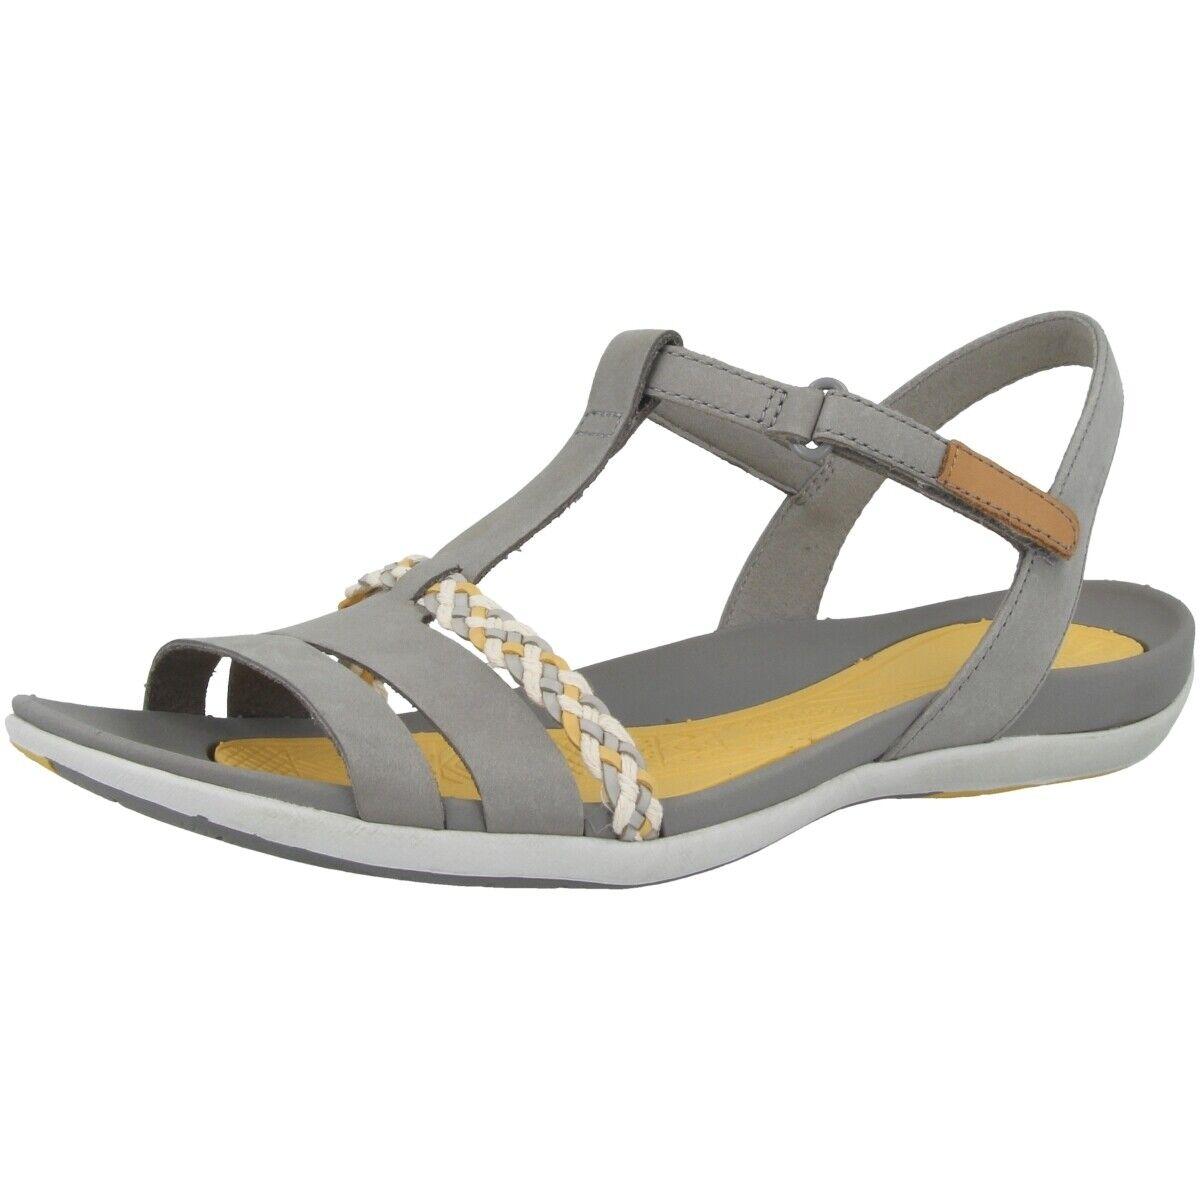 Clarks Tealite Grace Damen Sandale Freizeit Leder Sandaletten grau 26142360